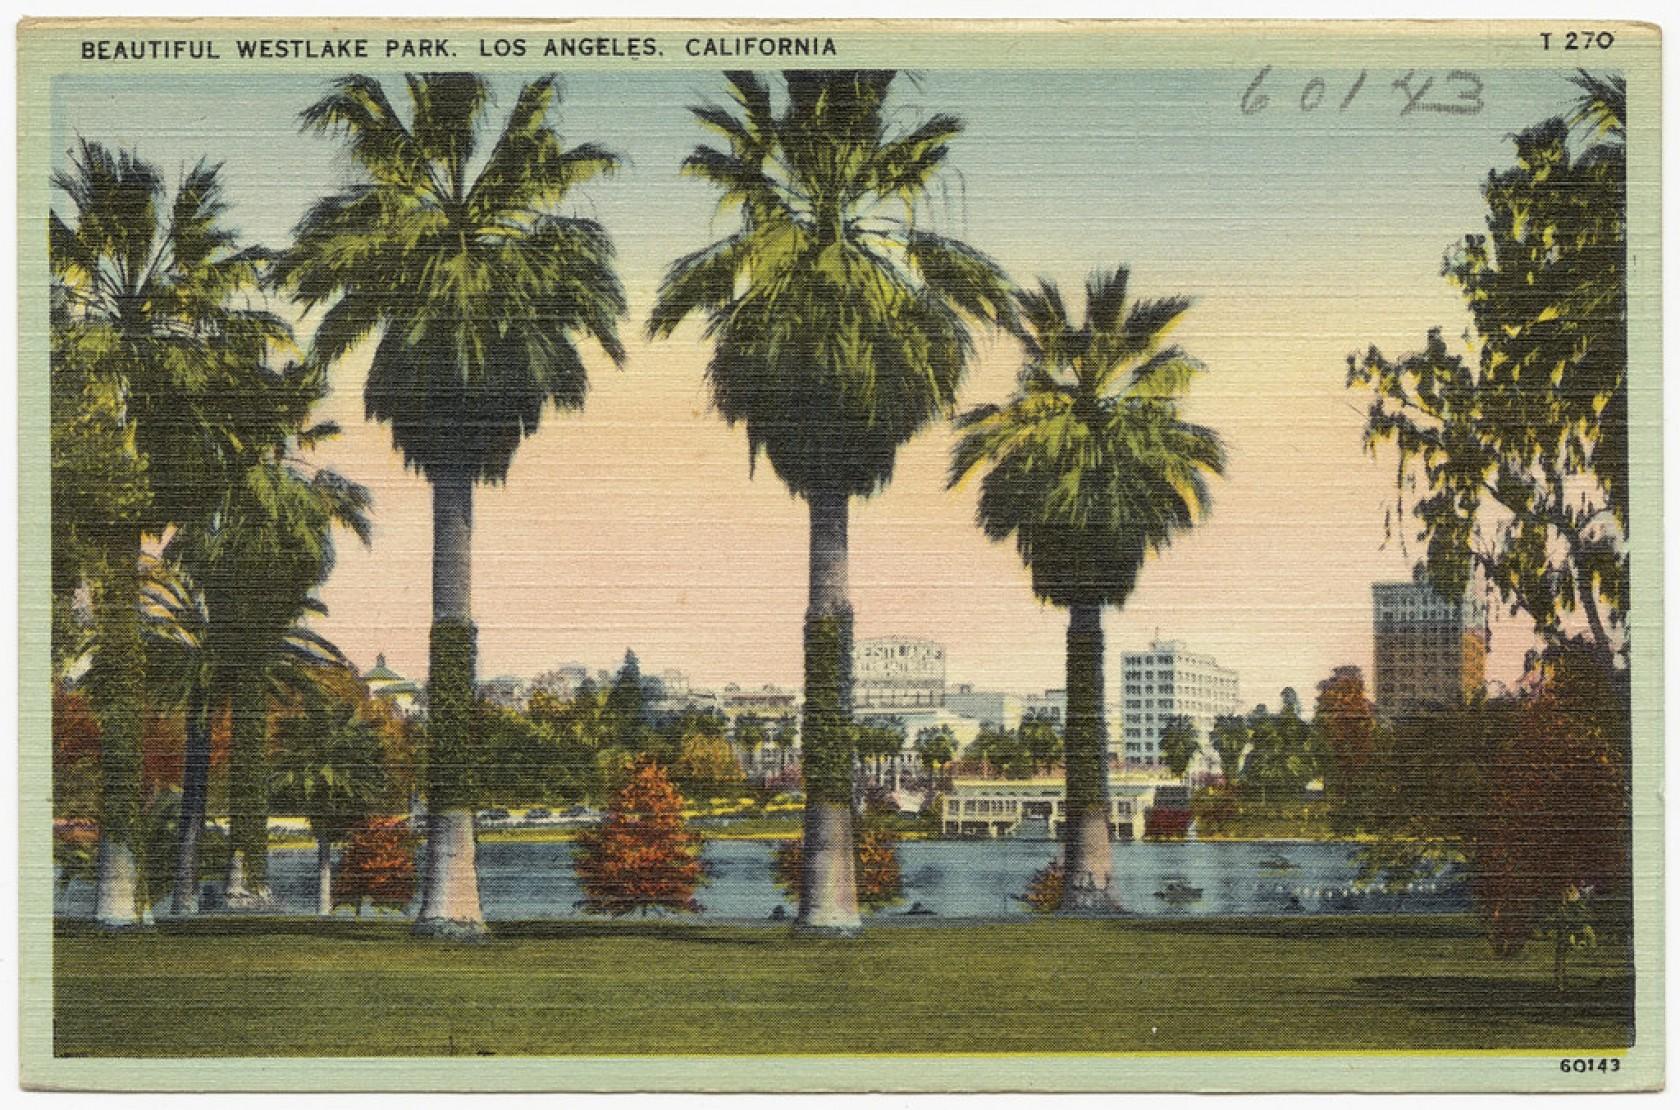 """Beautiful Westlake Park, Los Angeles, California"" by Boston Public Library"